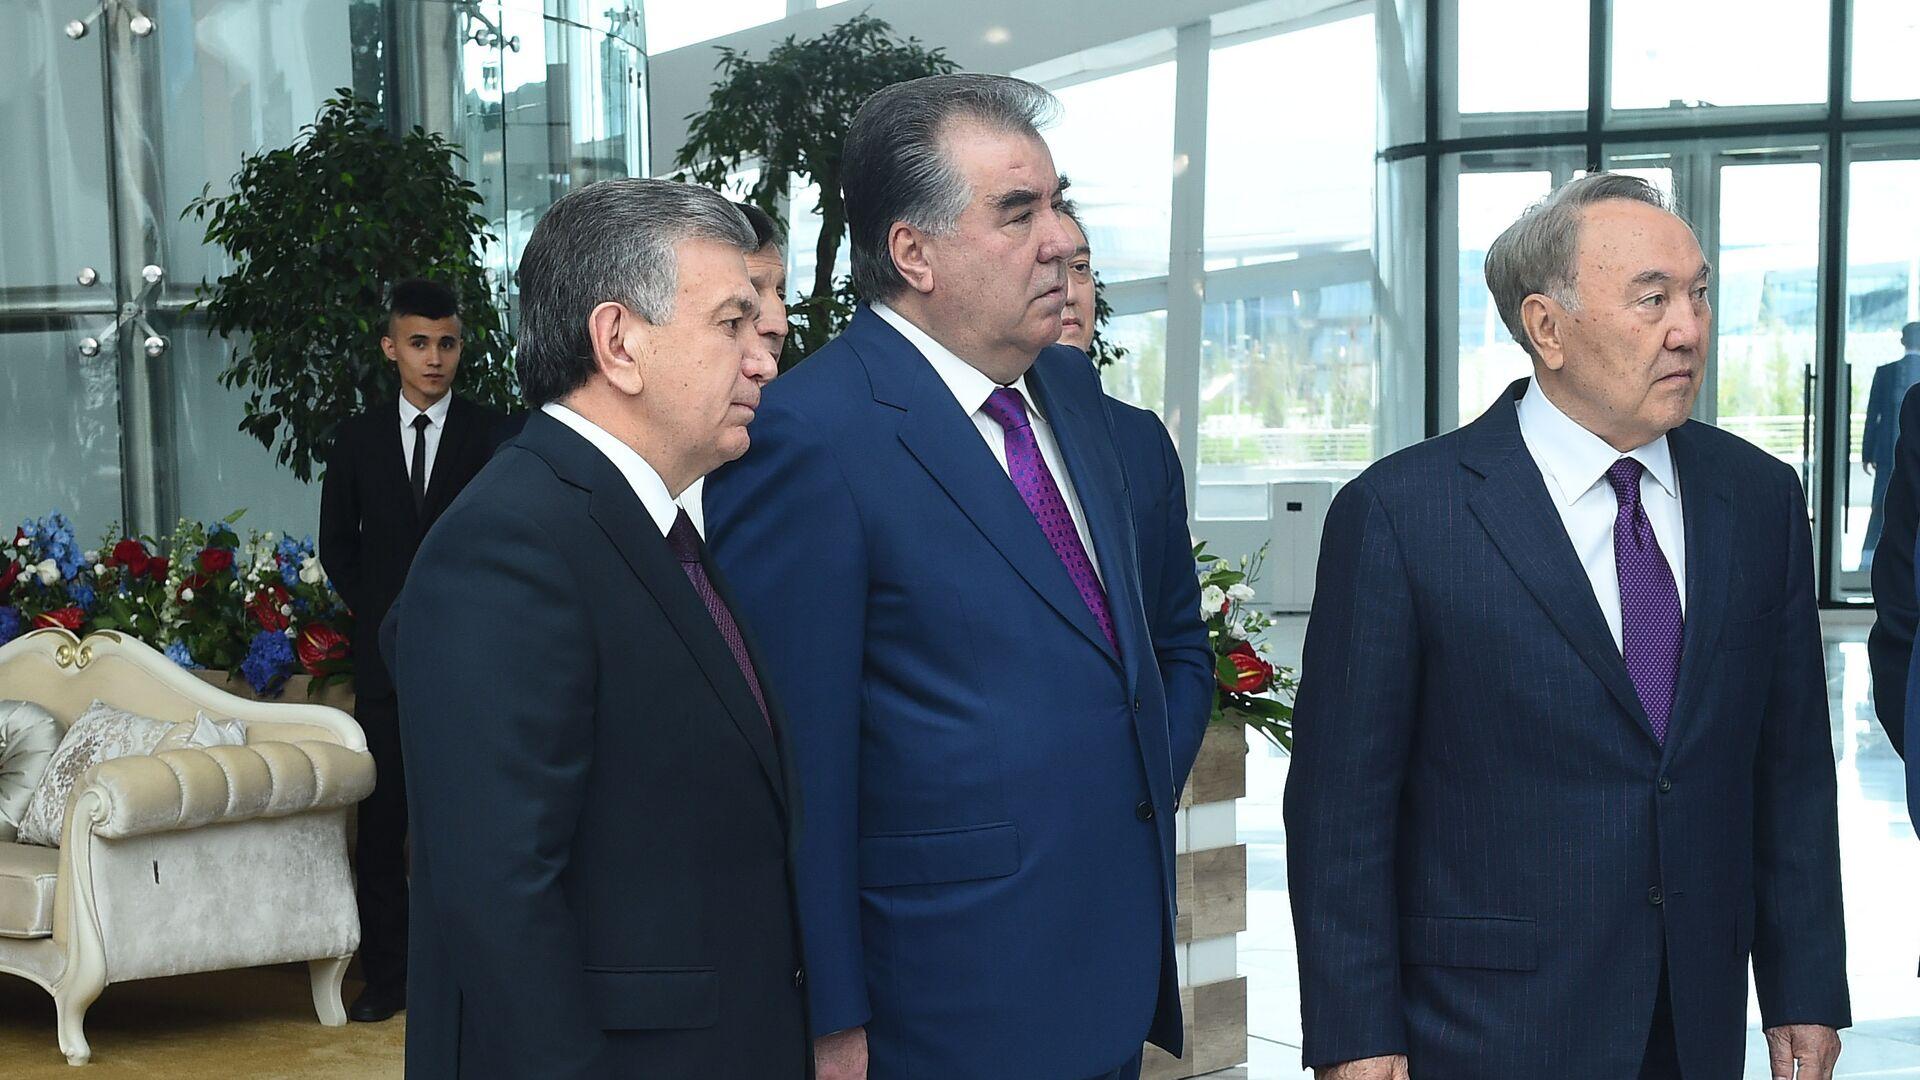 Президент Узбекистана Шавкат Мирзиёев, лидер Таджикистана Эмомали Рахмон и глава Казахстана Нурсултан Назарбаев  - Sputnik Таджикистан, 1920, 22.07.2021